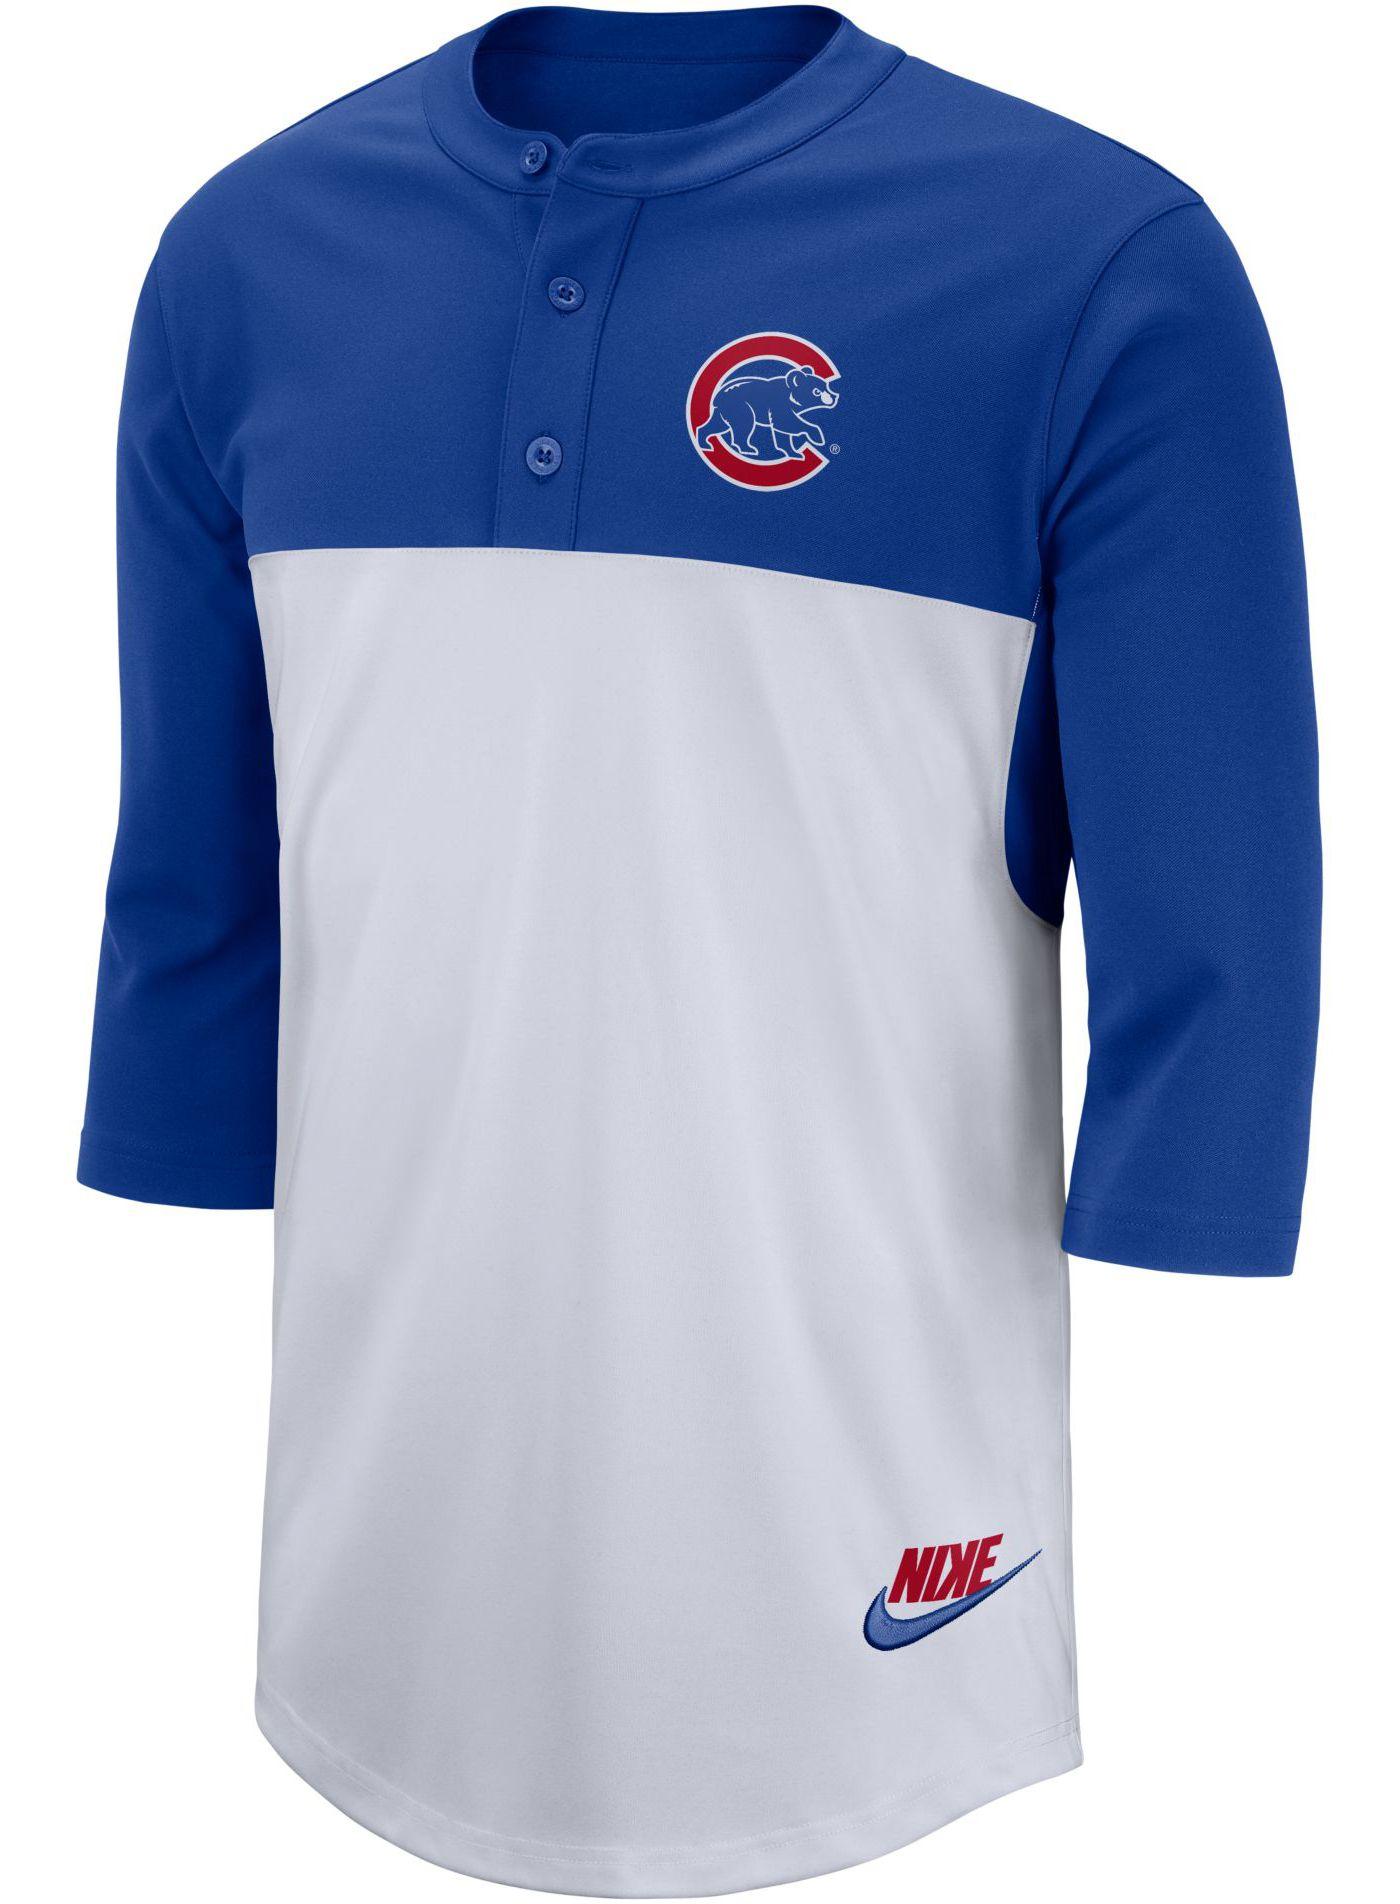 Nike Men's Chicago Cubs Dri-FIT Henley Three-Quarter Sleeve Shirt